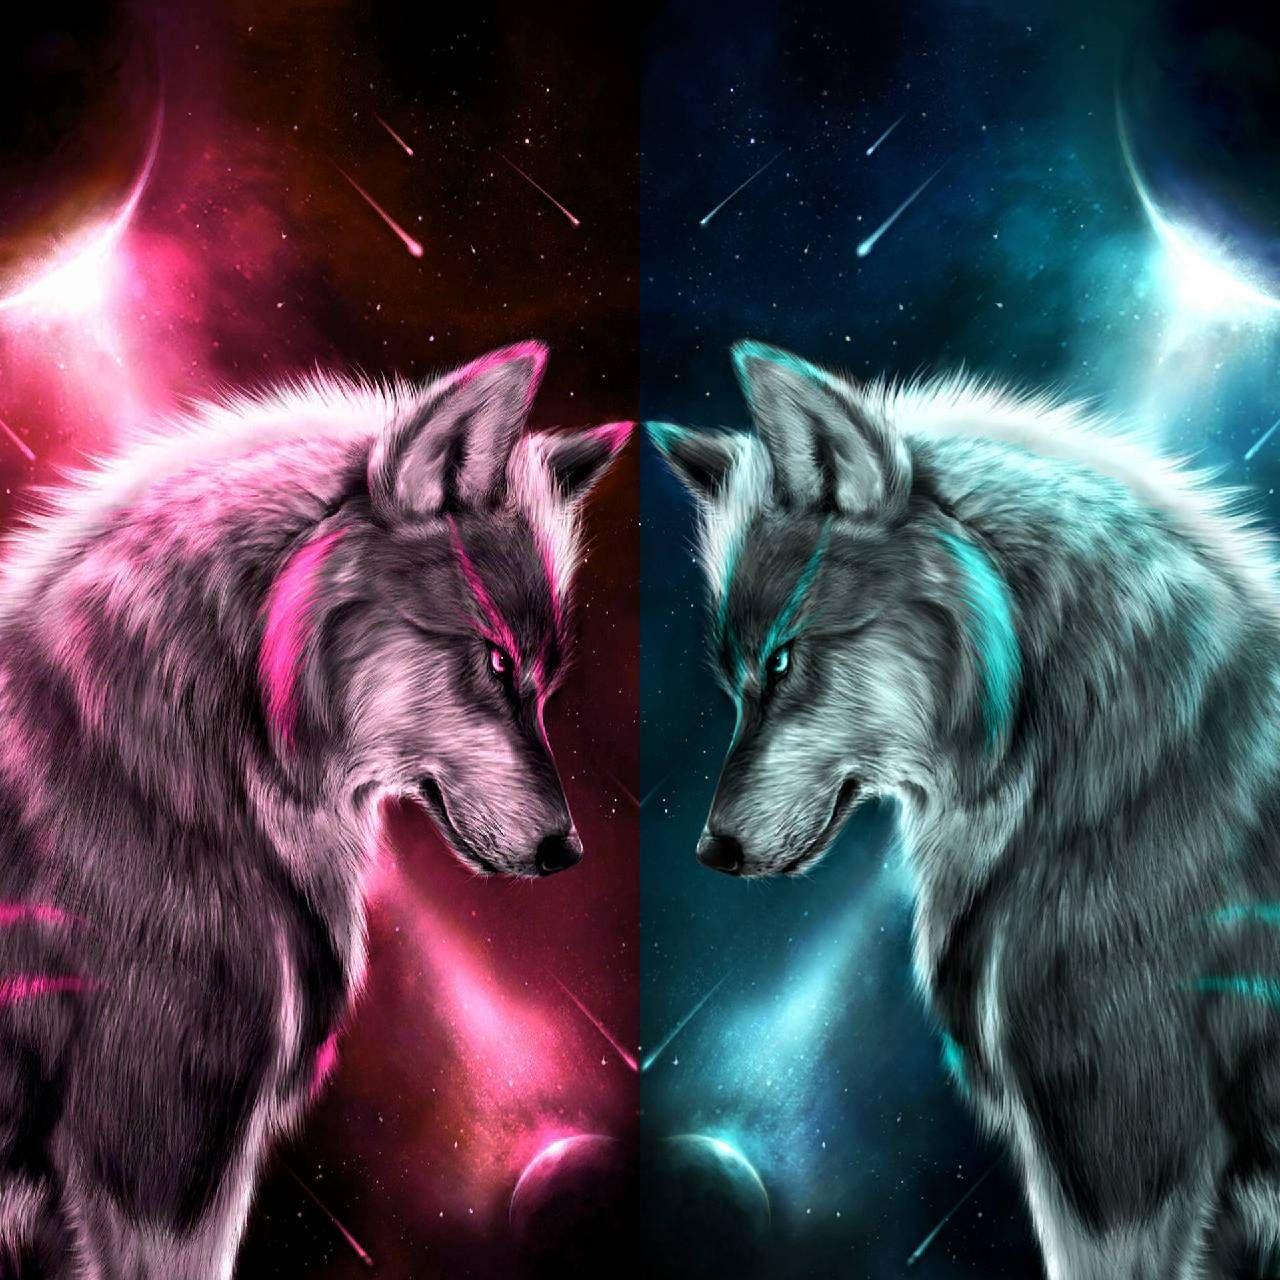 Pin By Celia On Sky Wolf Artwork Cute Animal Drawings Wolf Spirit Animal